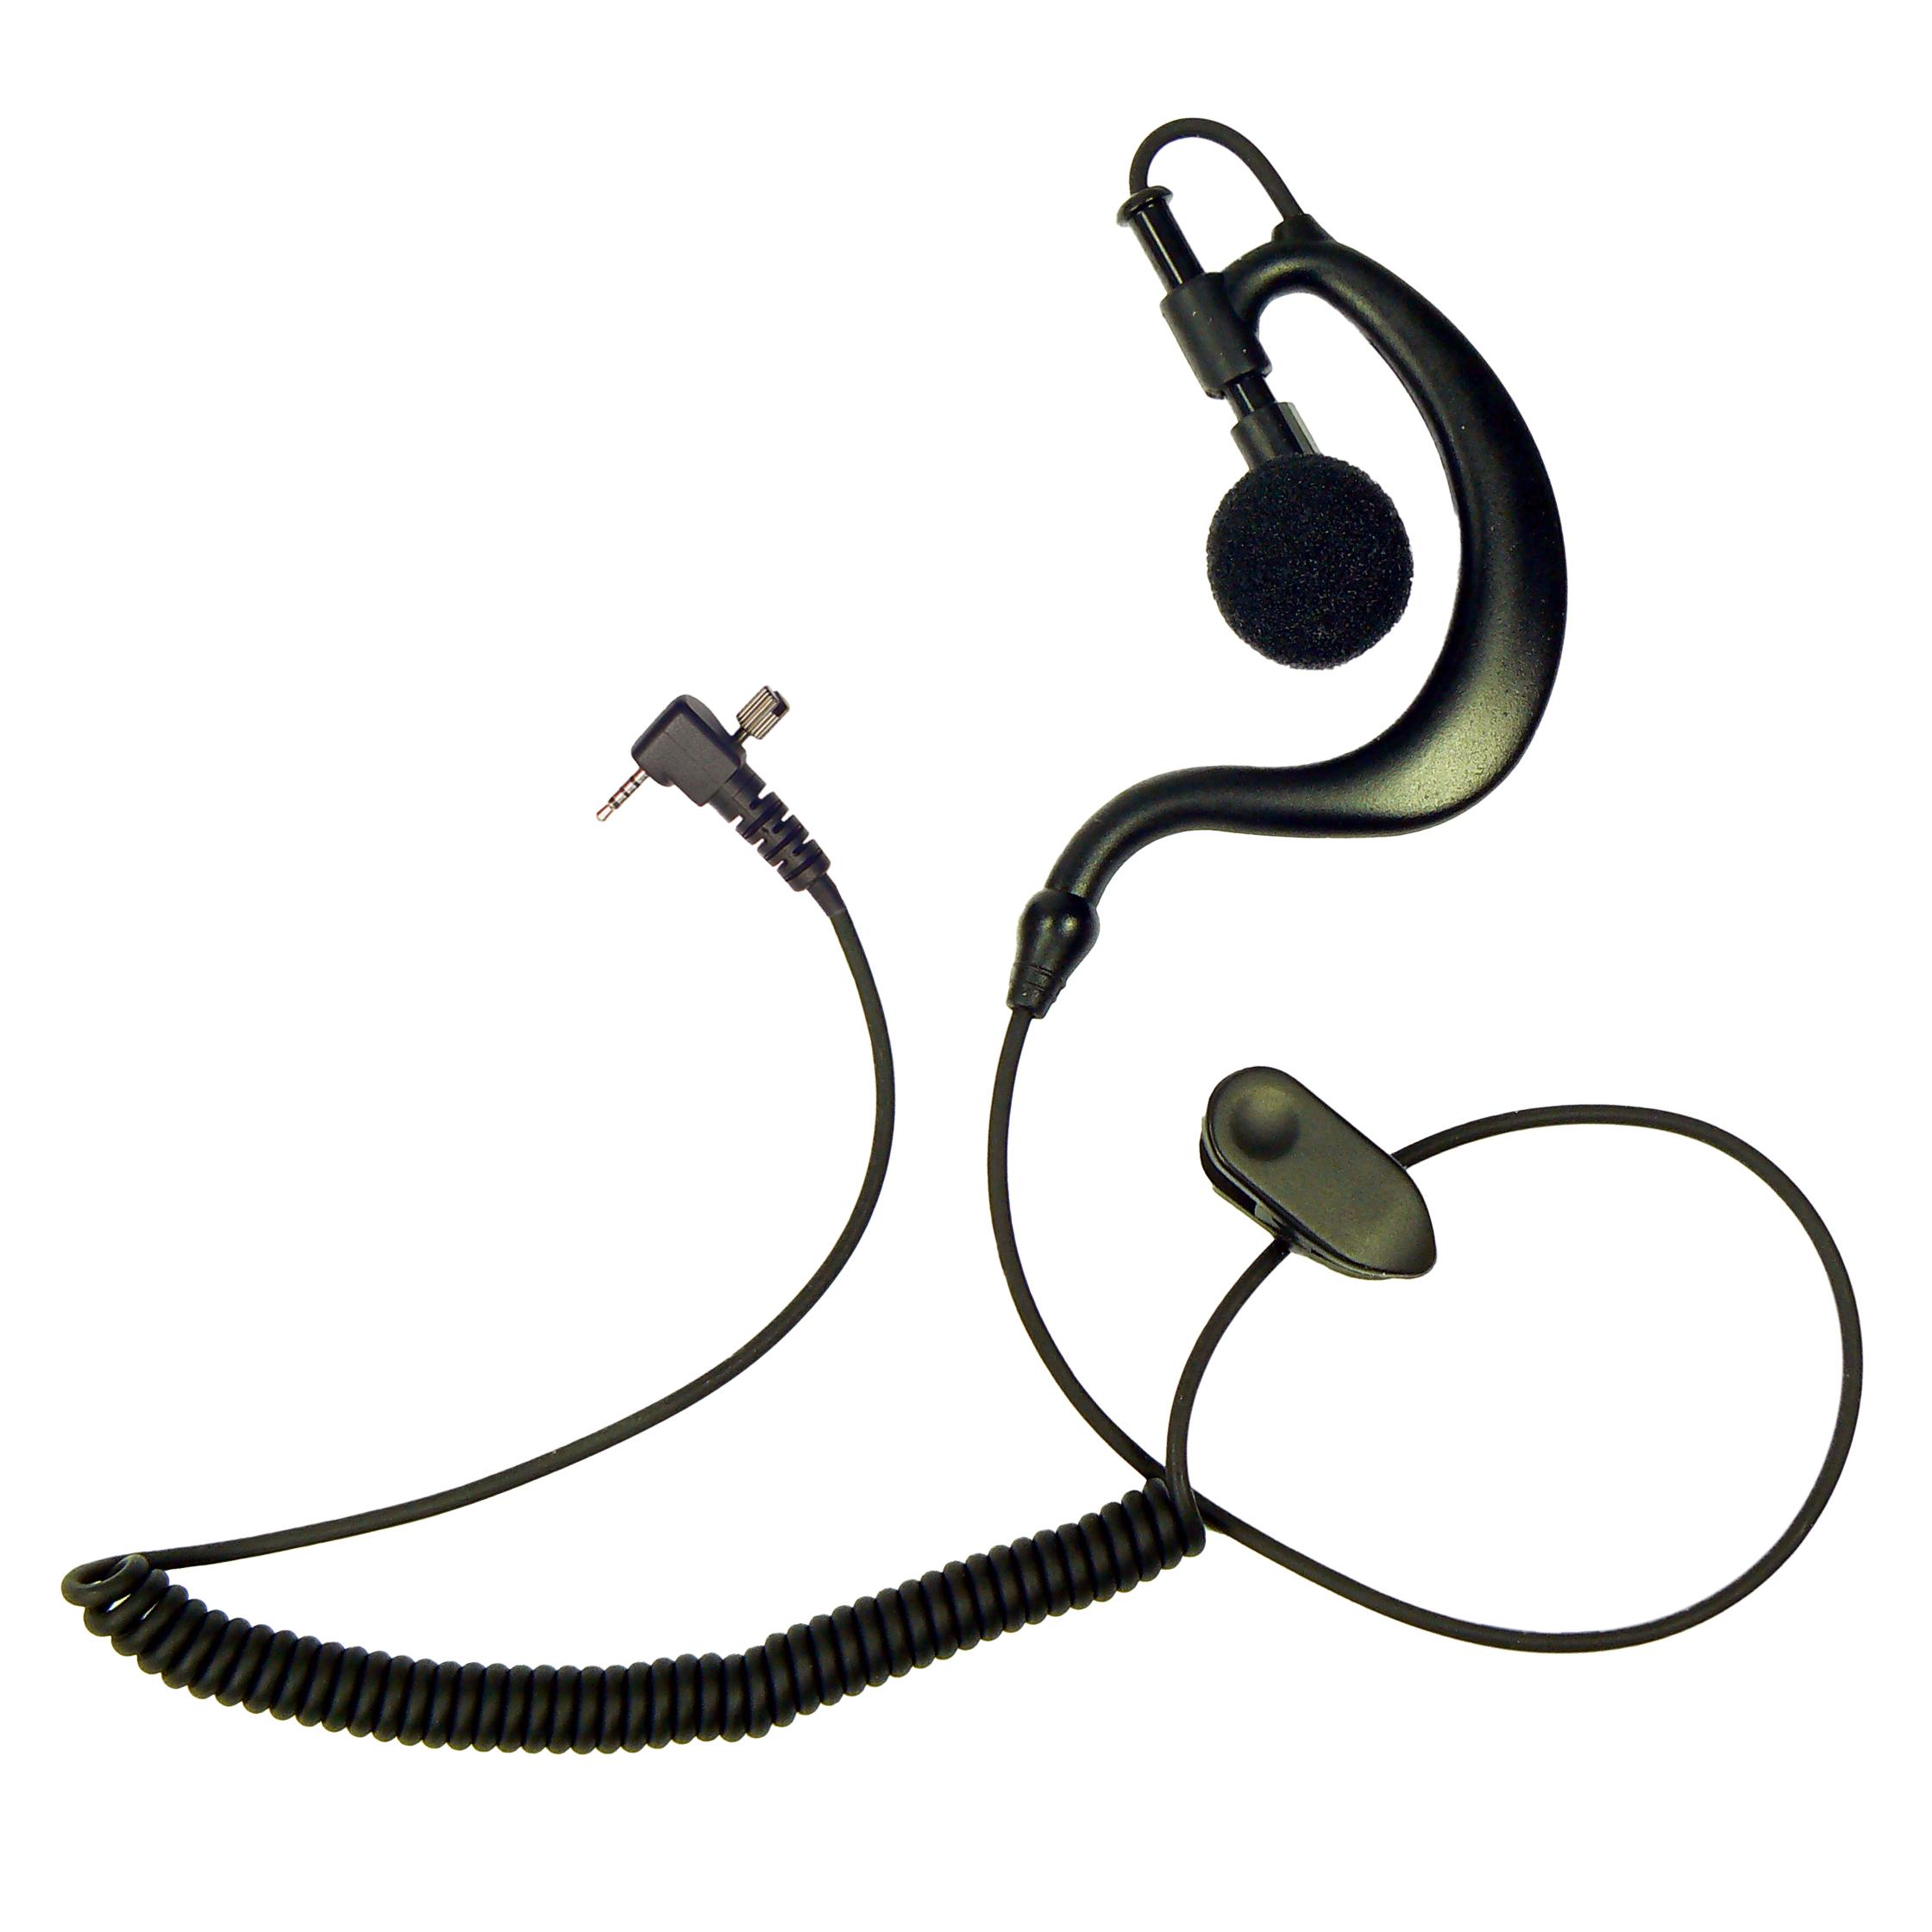 G-Shape earpiece Sepura Tetra radio